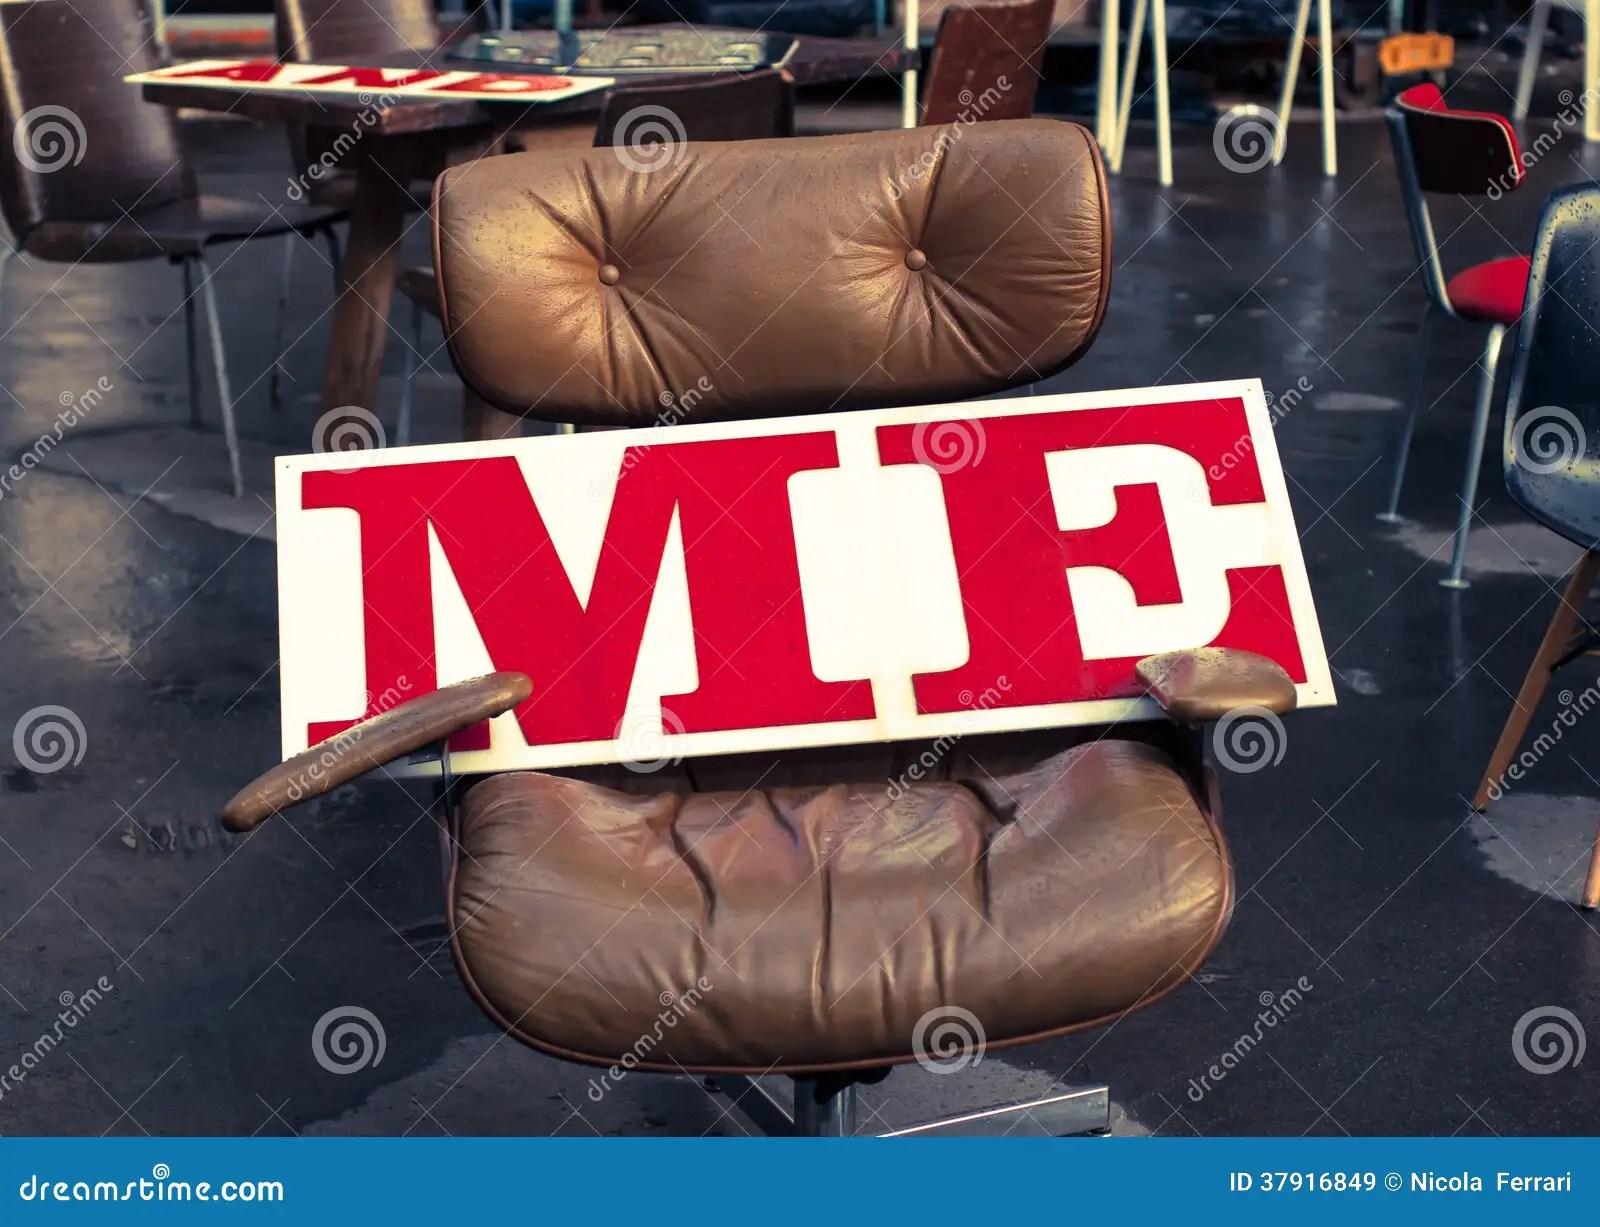 ferrari office chair uk hook on vs high me written in red a big white board an